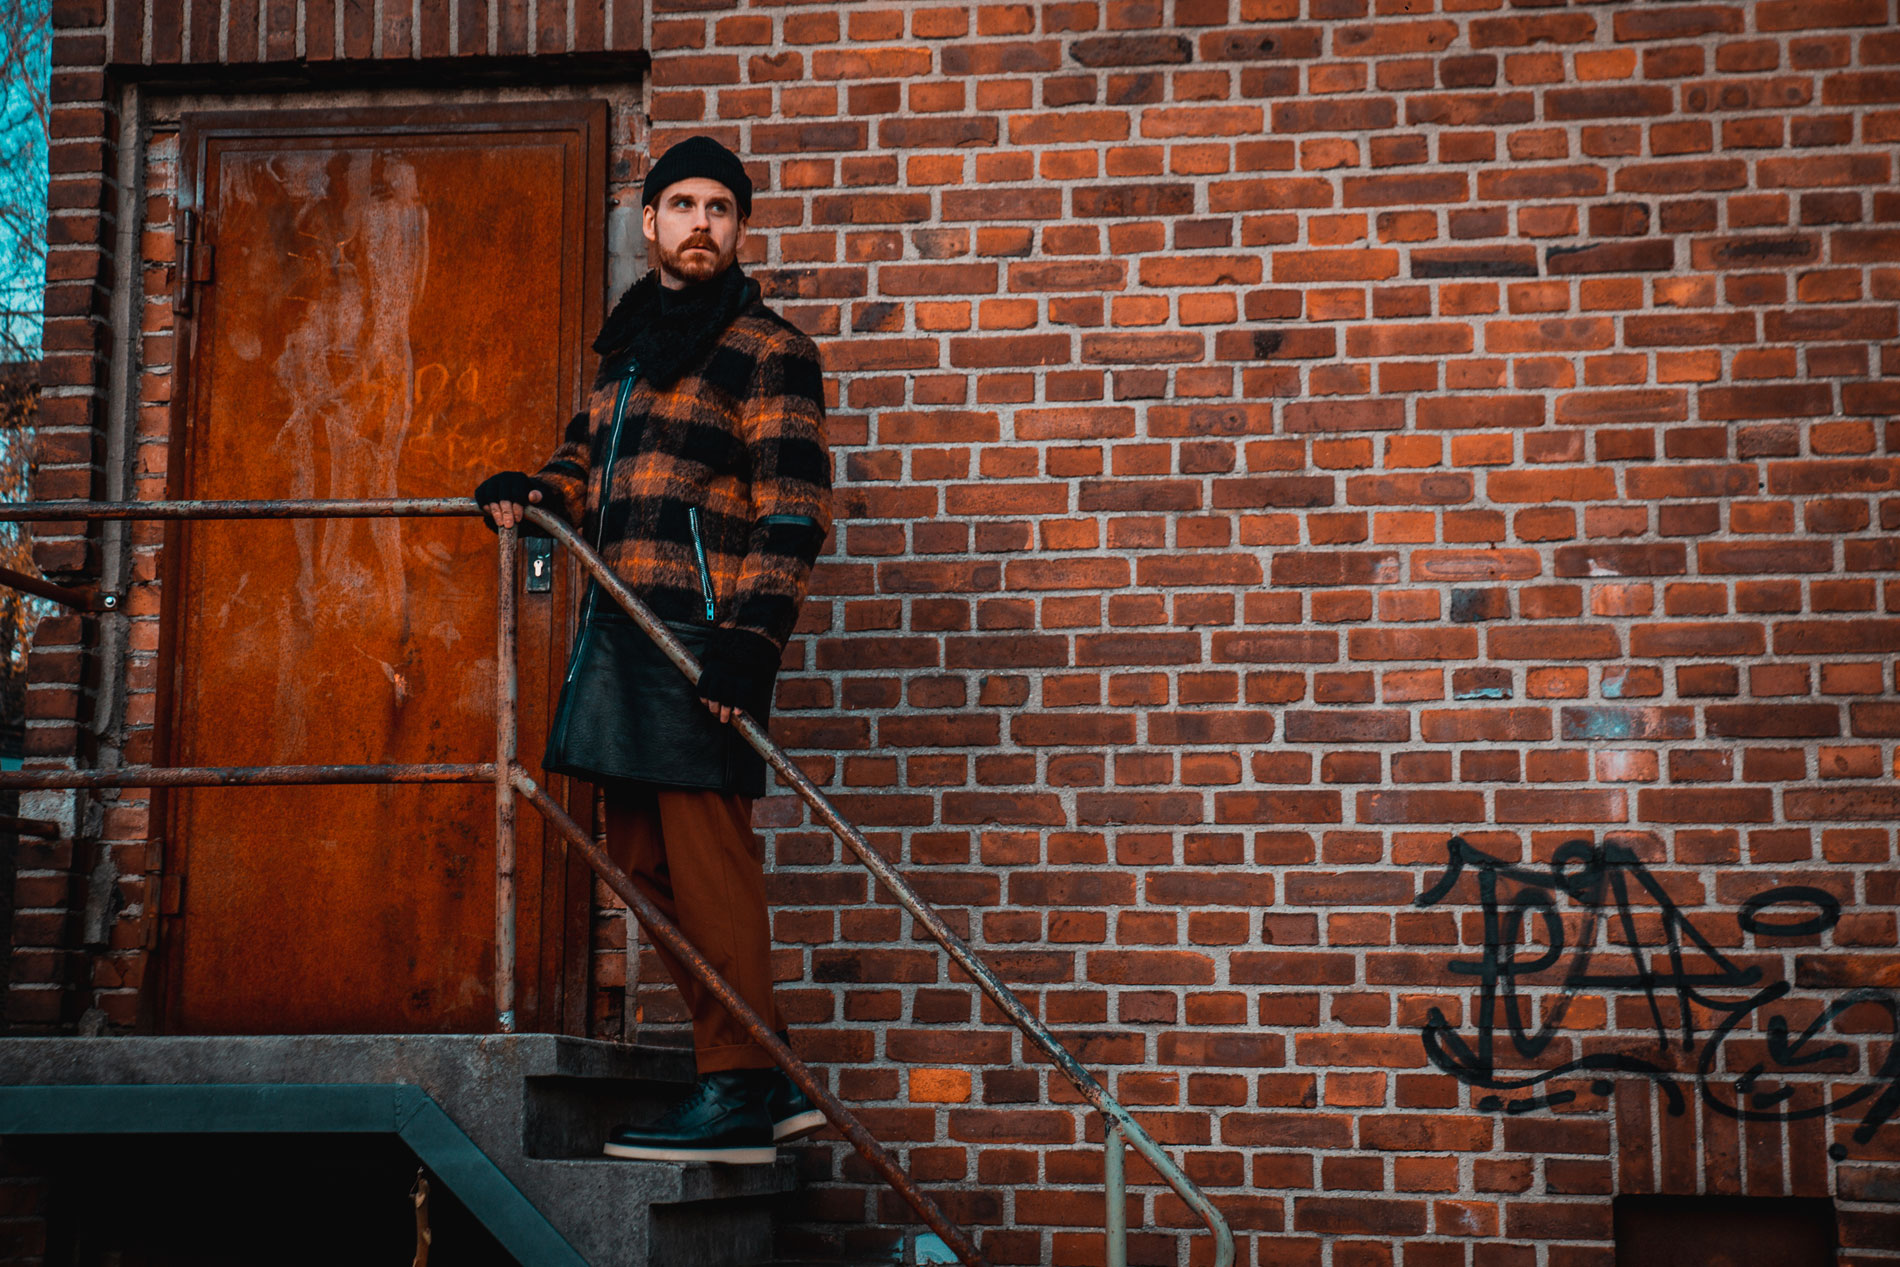 Malemodel-Winterlook-Wollmantel-Style-Malfashion-Blog